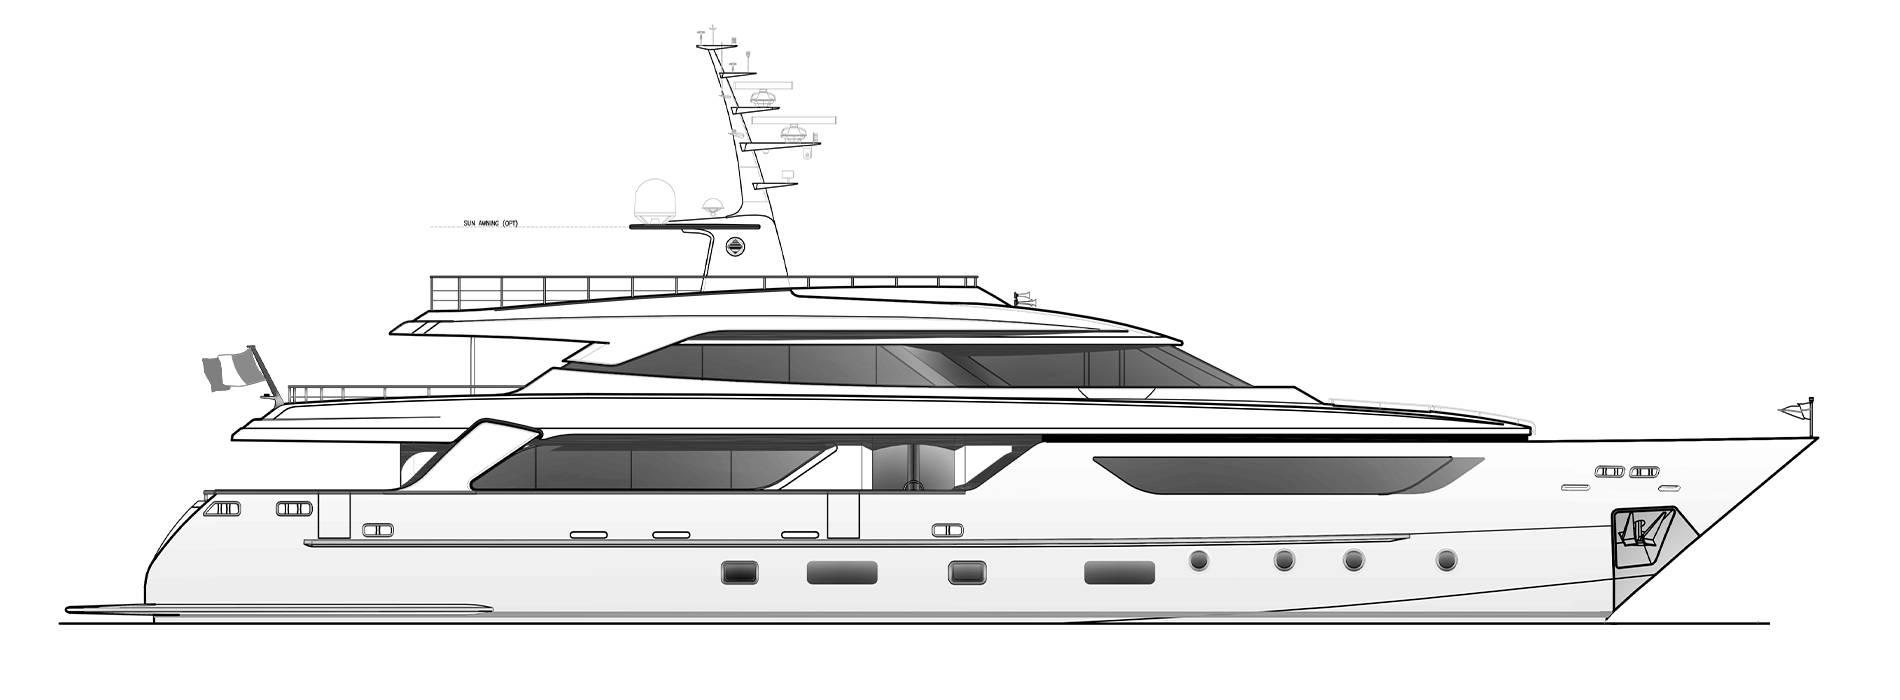 Sanlorenzo Yachts SD122-27 under offer 外观